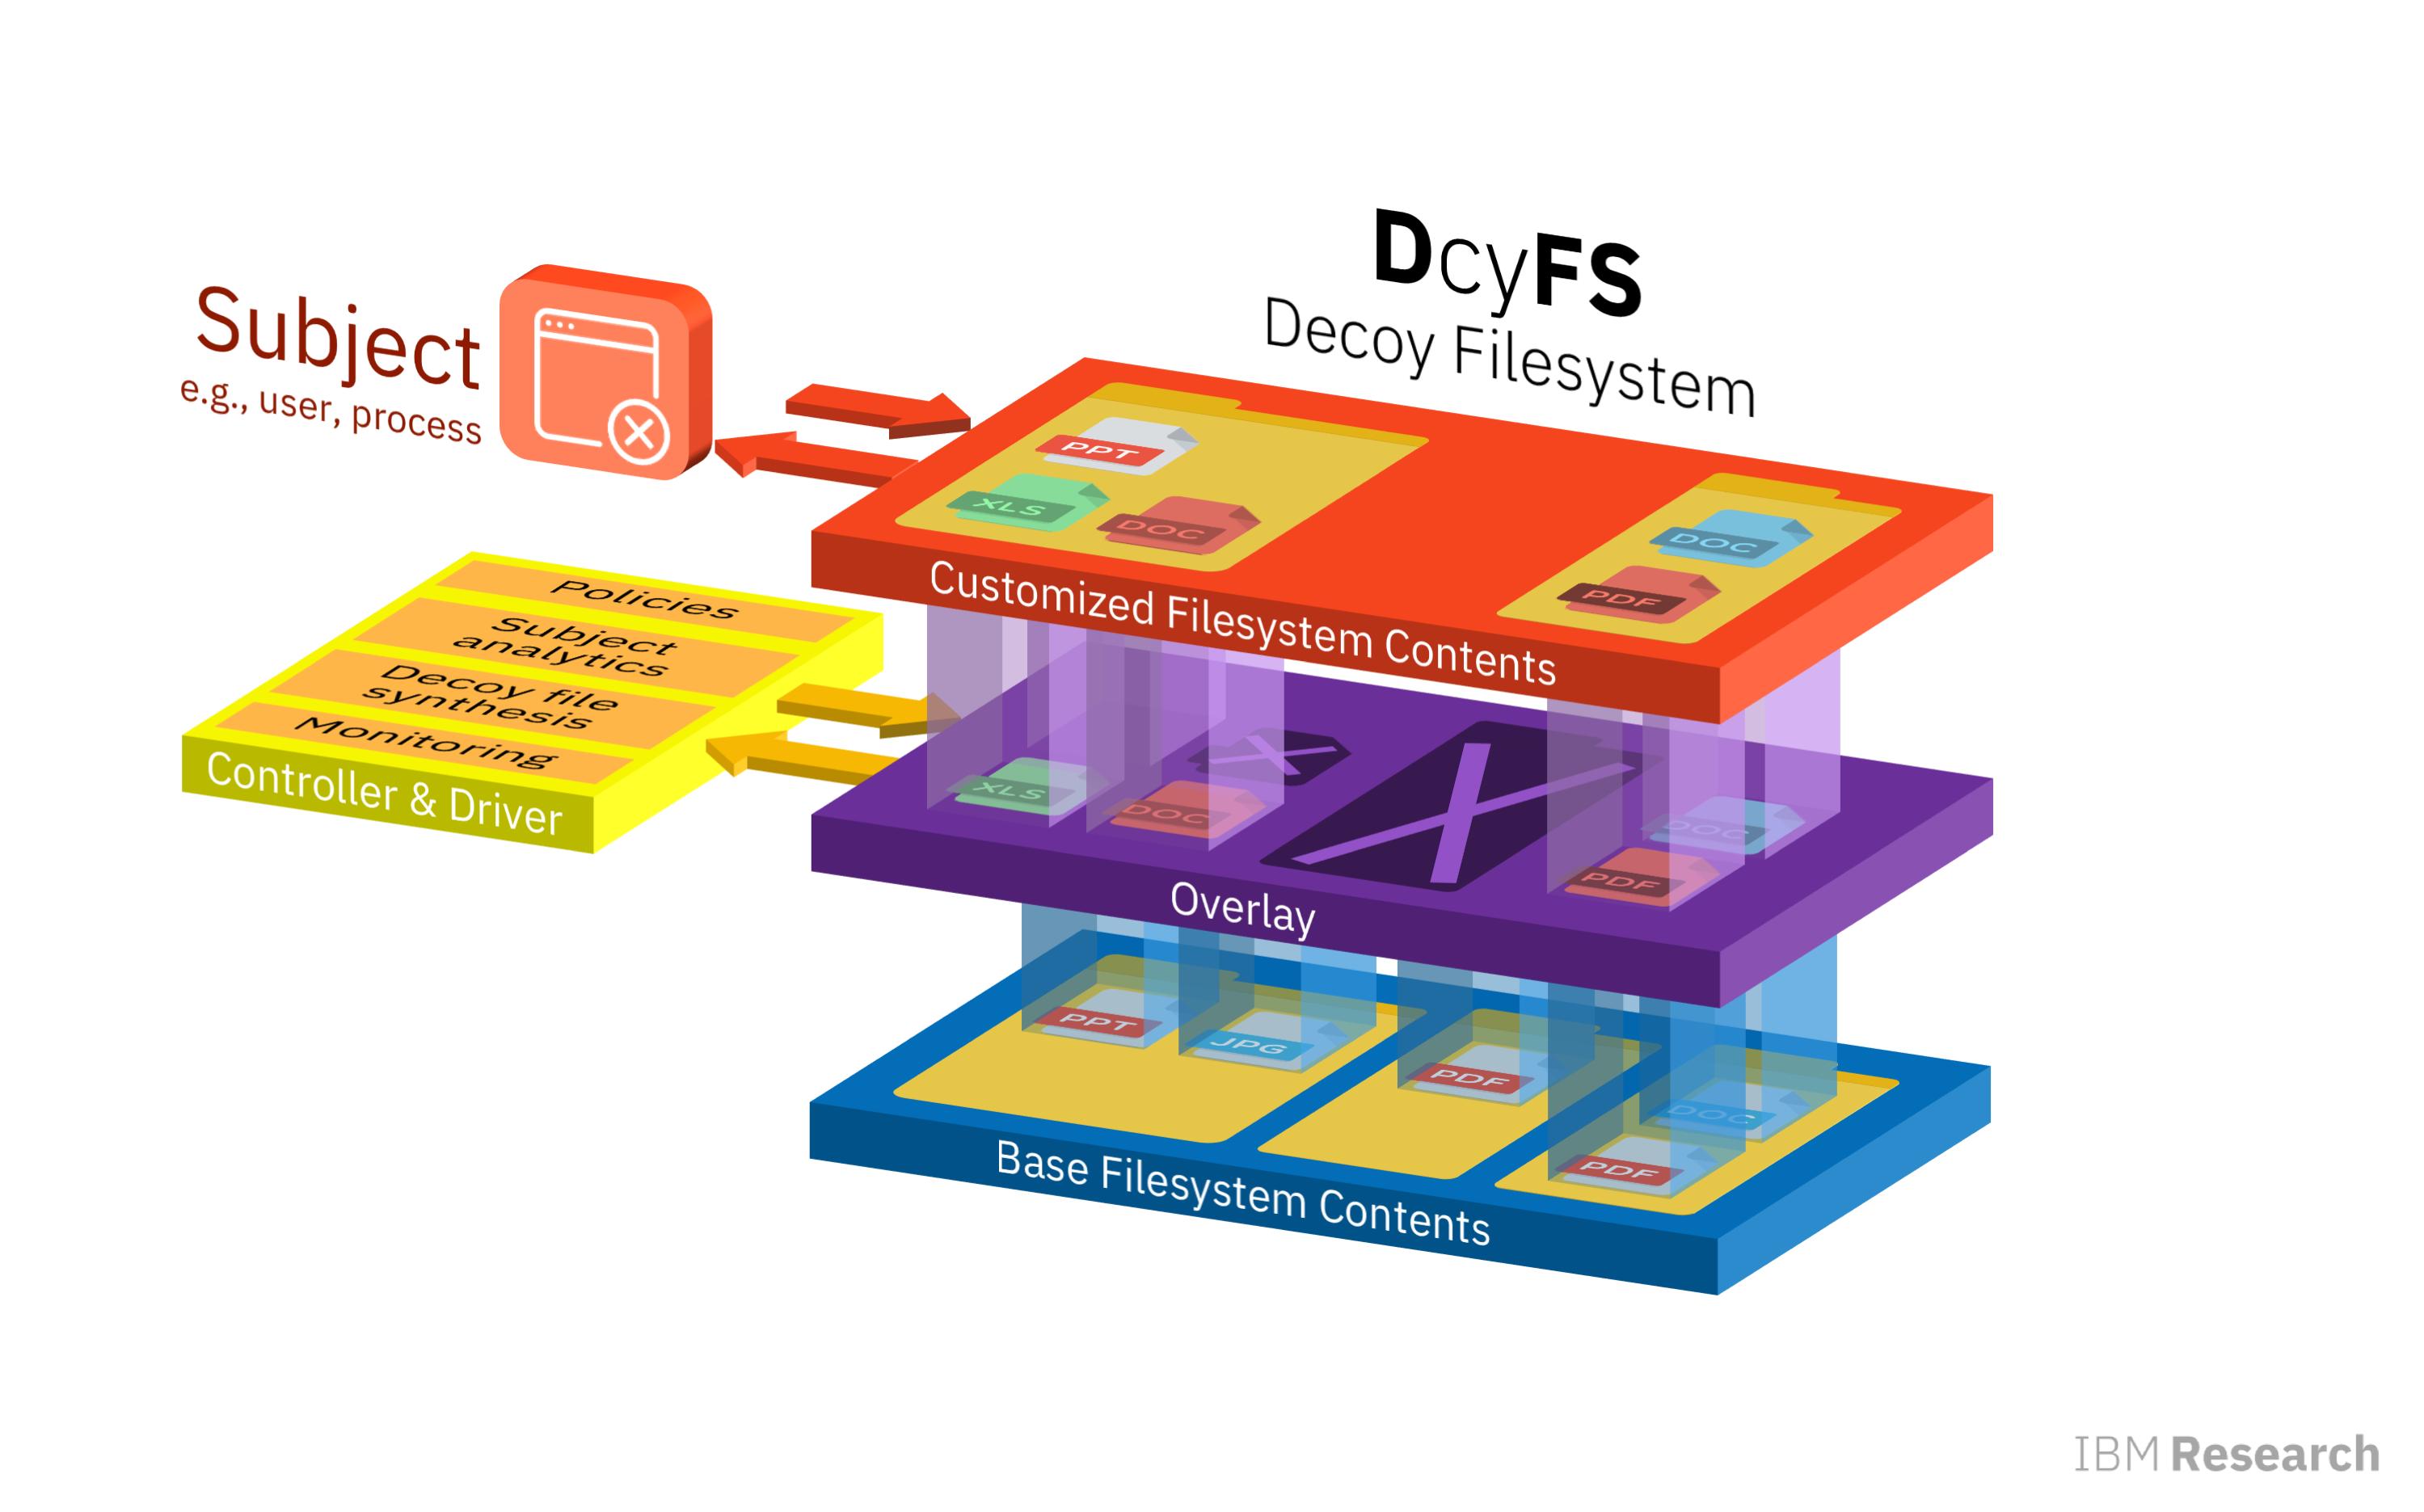 DcyFS Decoy Filesystem